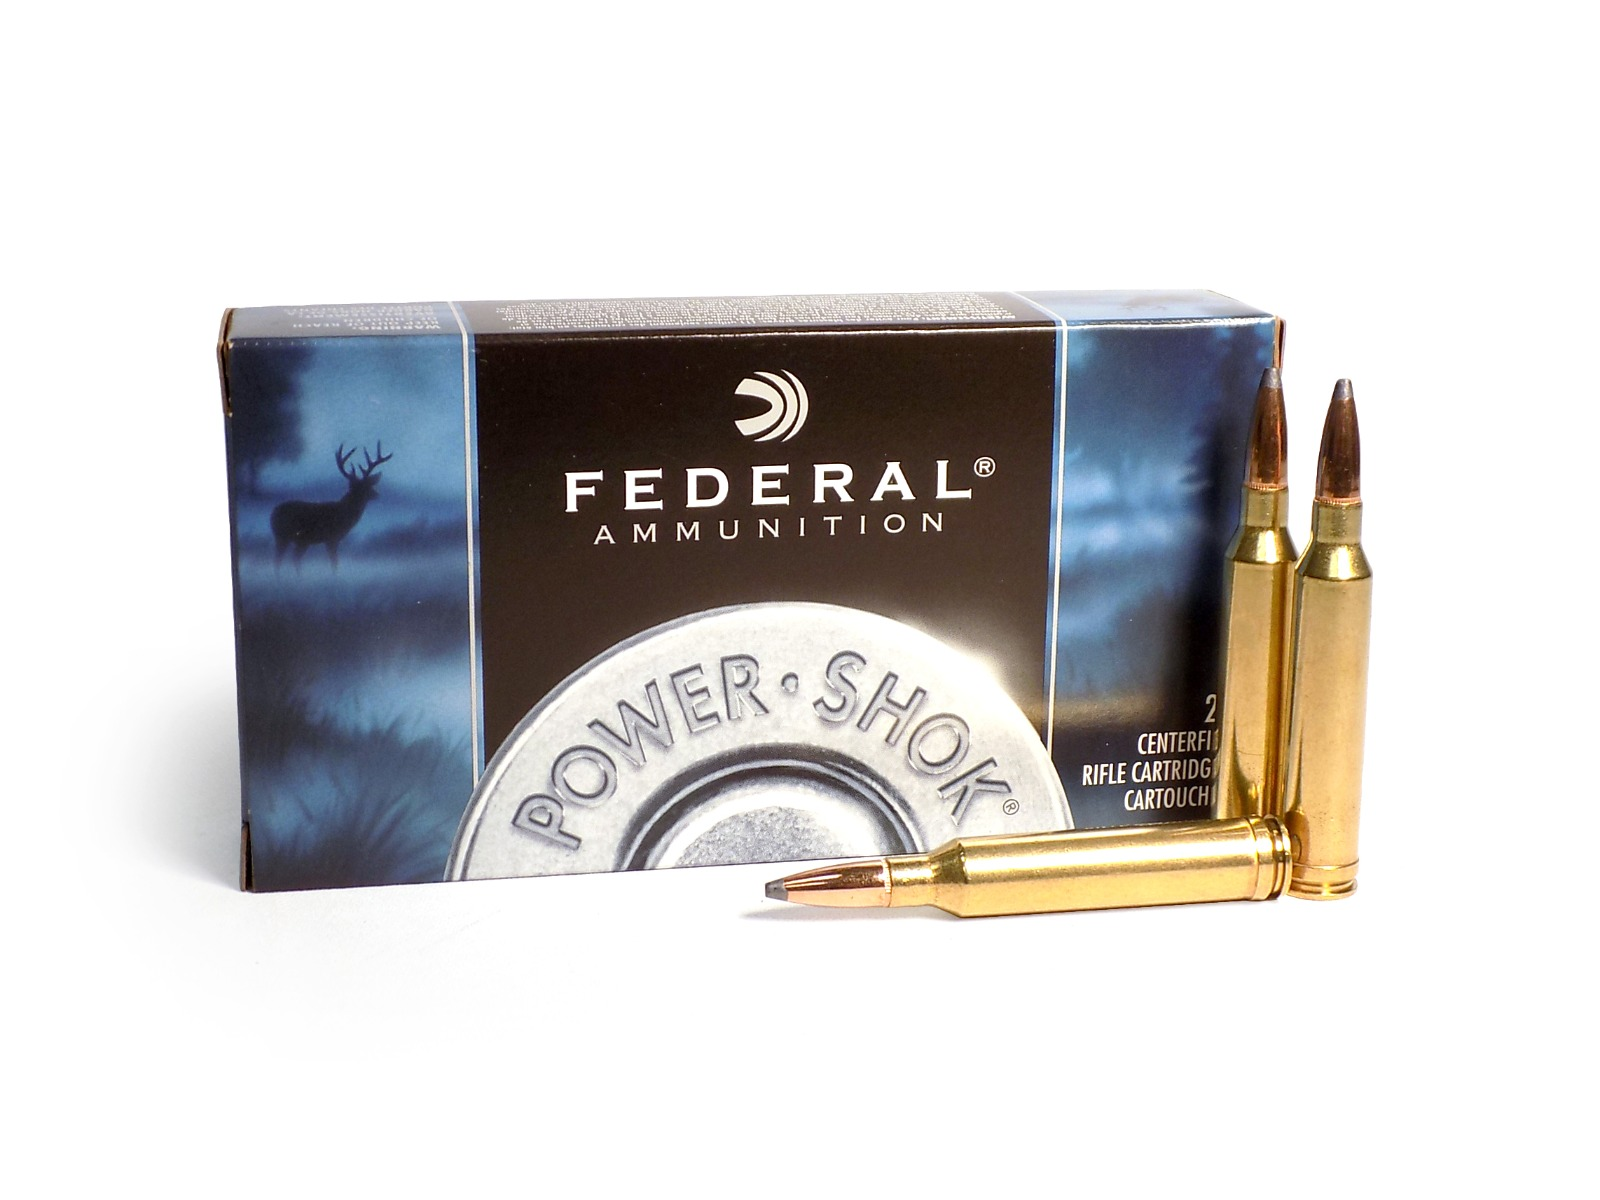 7mm Rem Mag Ammo - Ammunition Depot